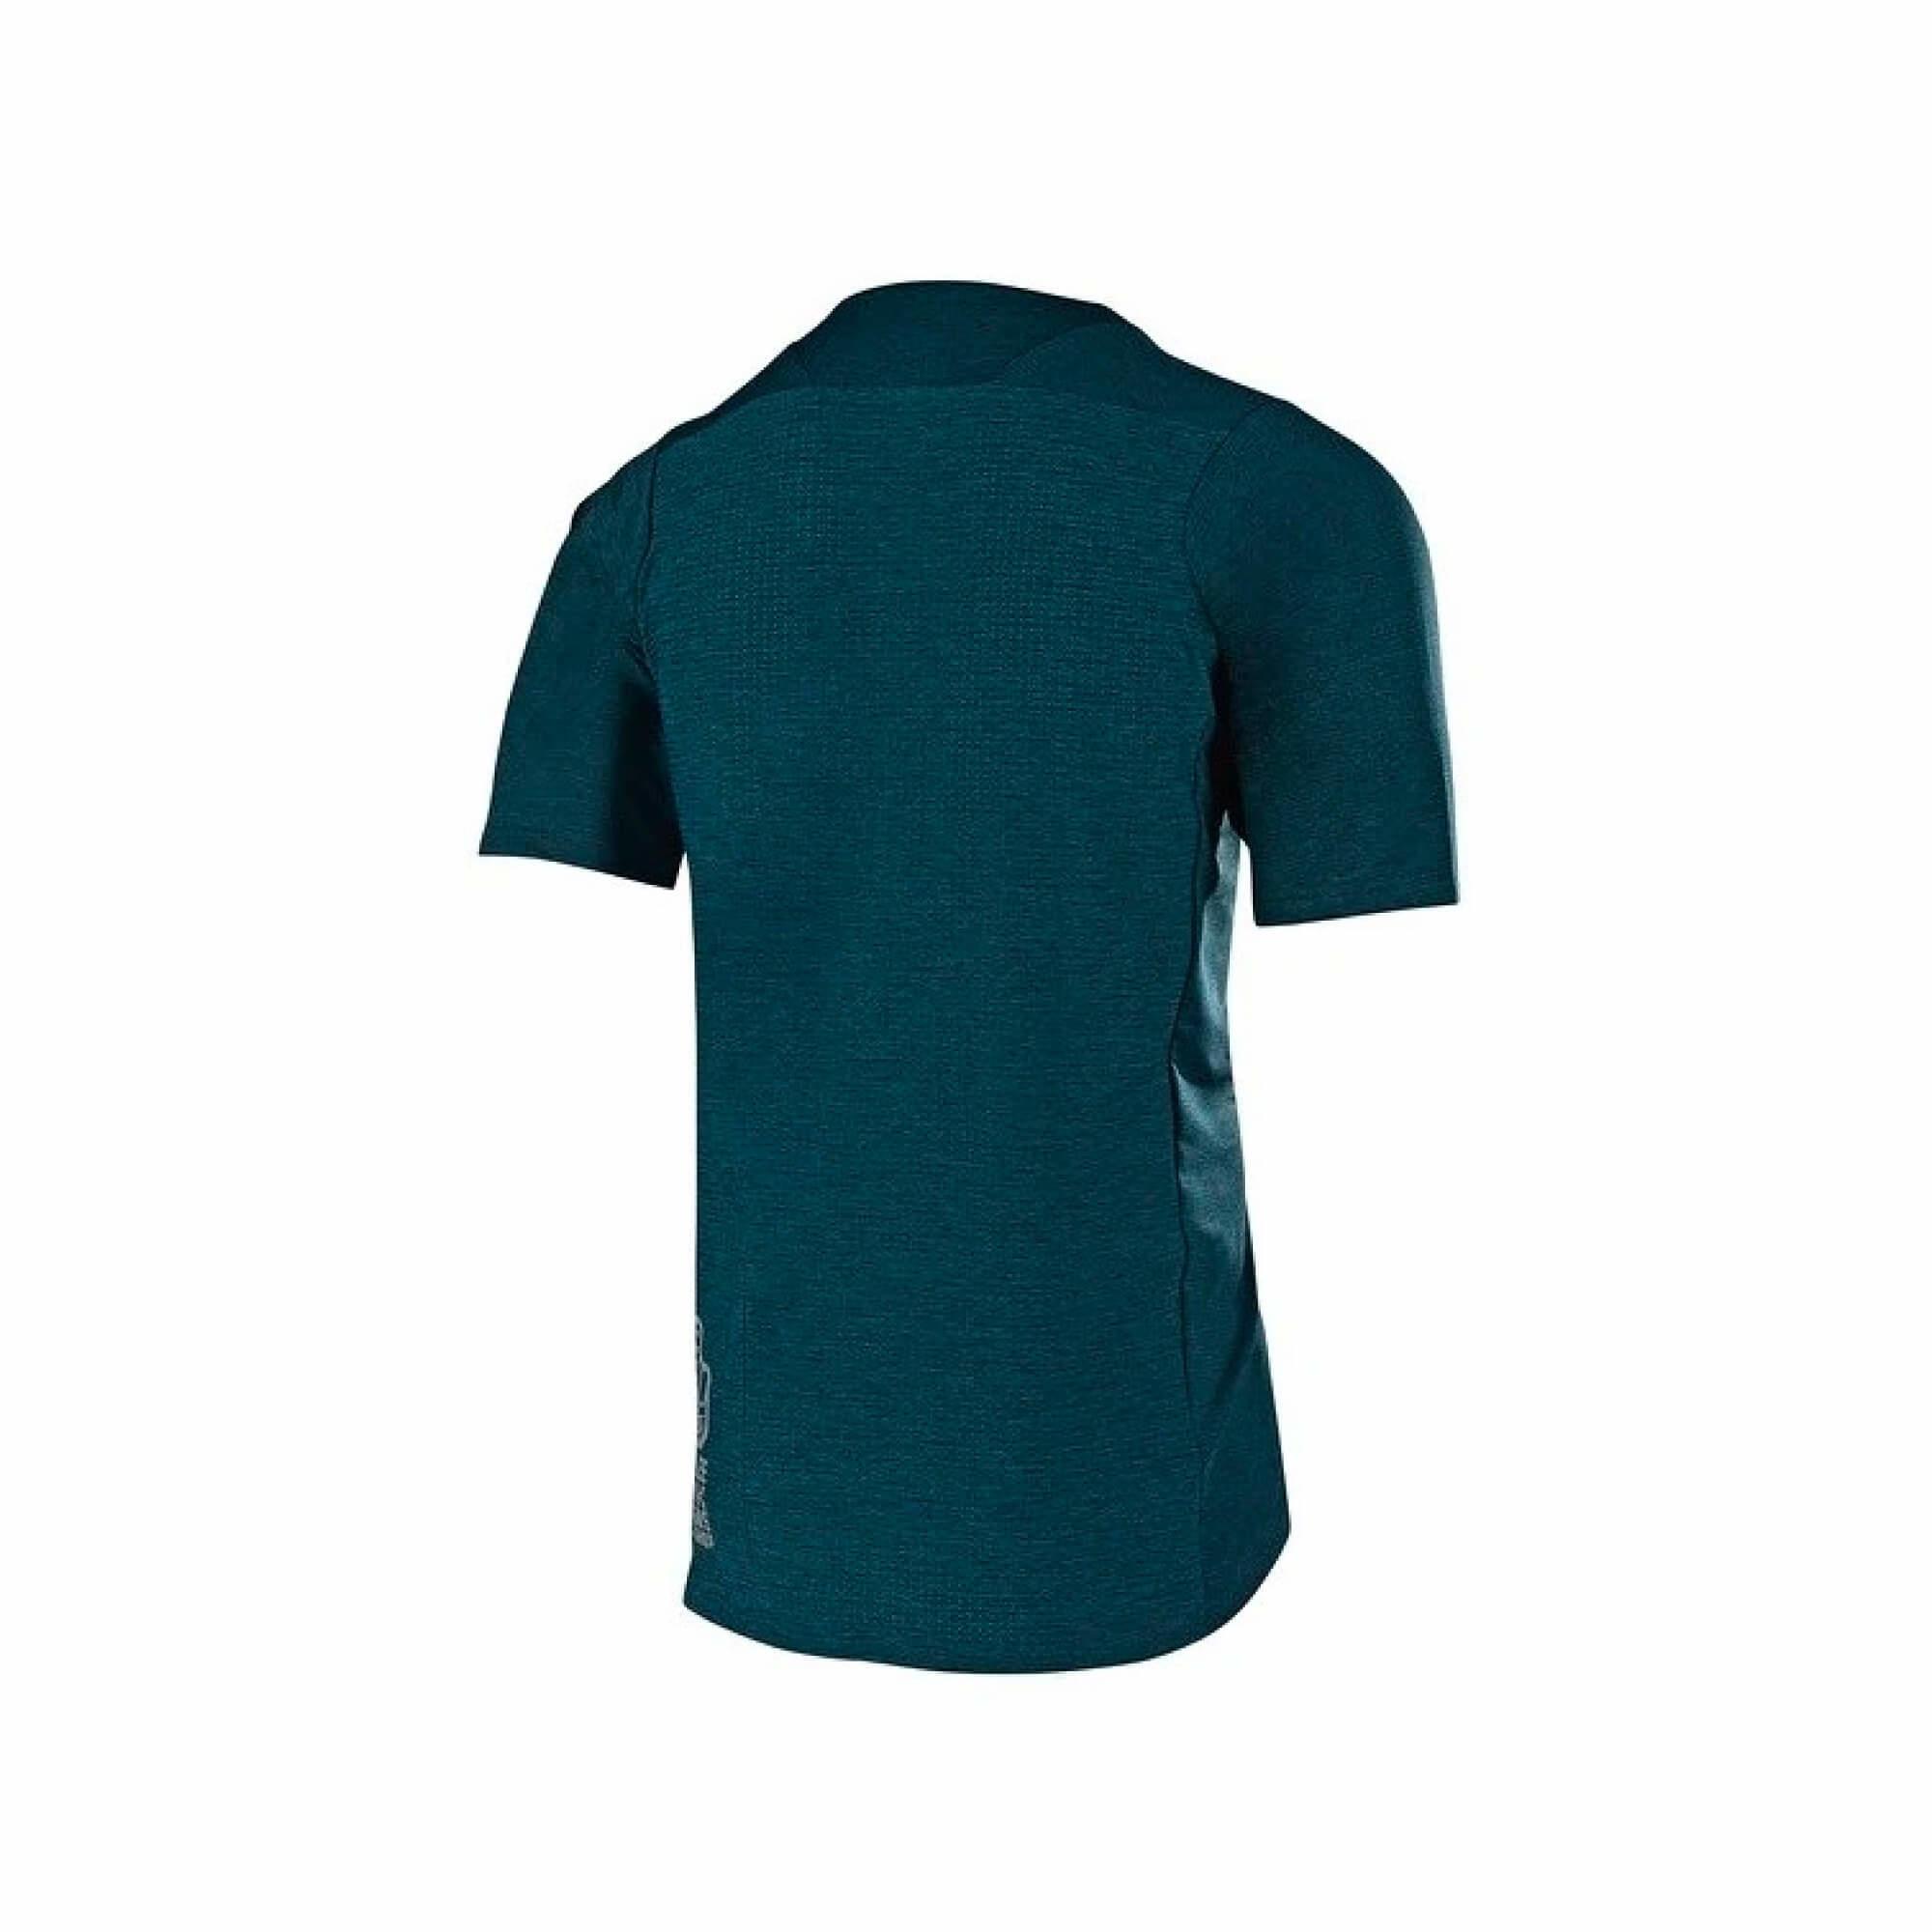 Skyline Short Sleeve Jersey HTR 20-2